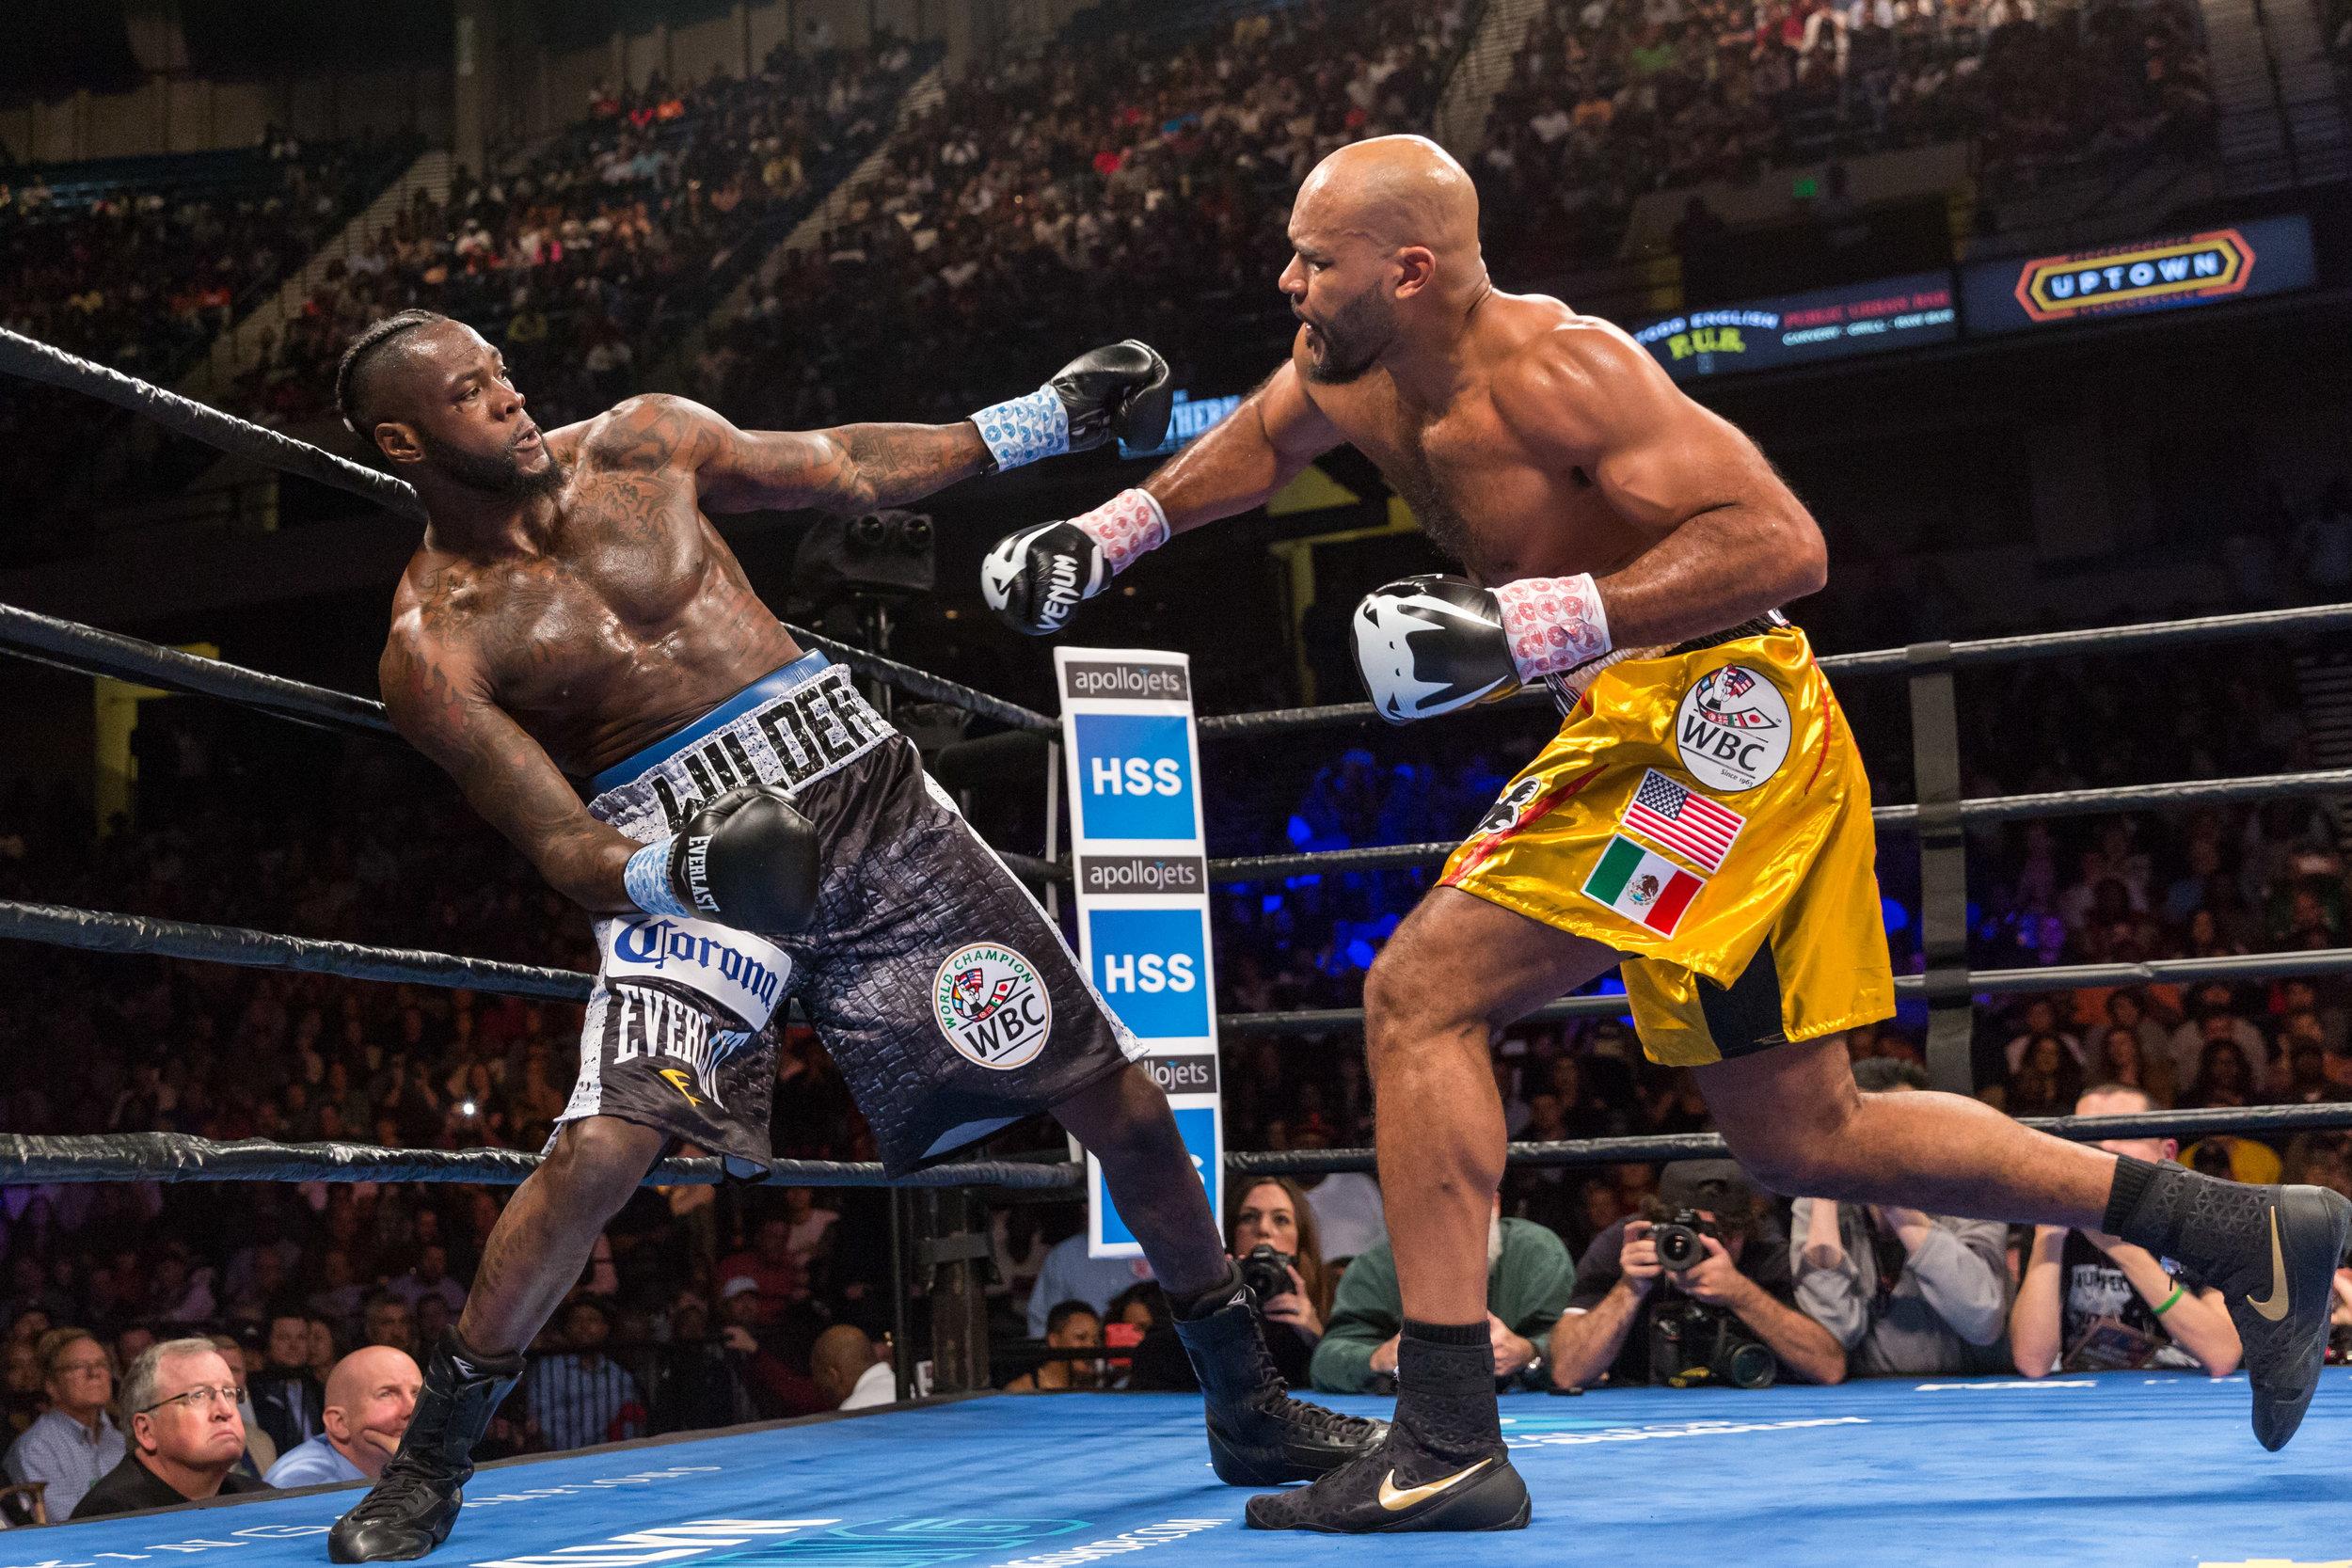 Deontay Wilder vs Gerald Washington - February 25_ 2017_02_25_2017_Fight_Ryan Hafey _ Premier Boxing Champions5.jpg